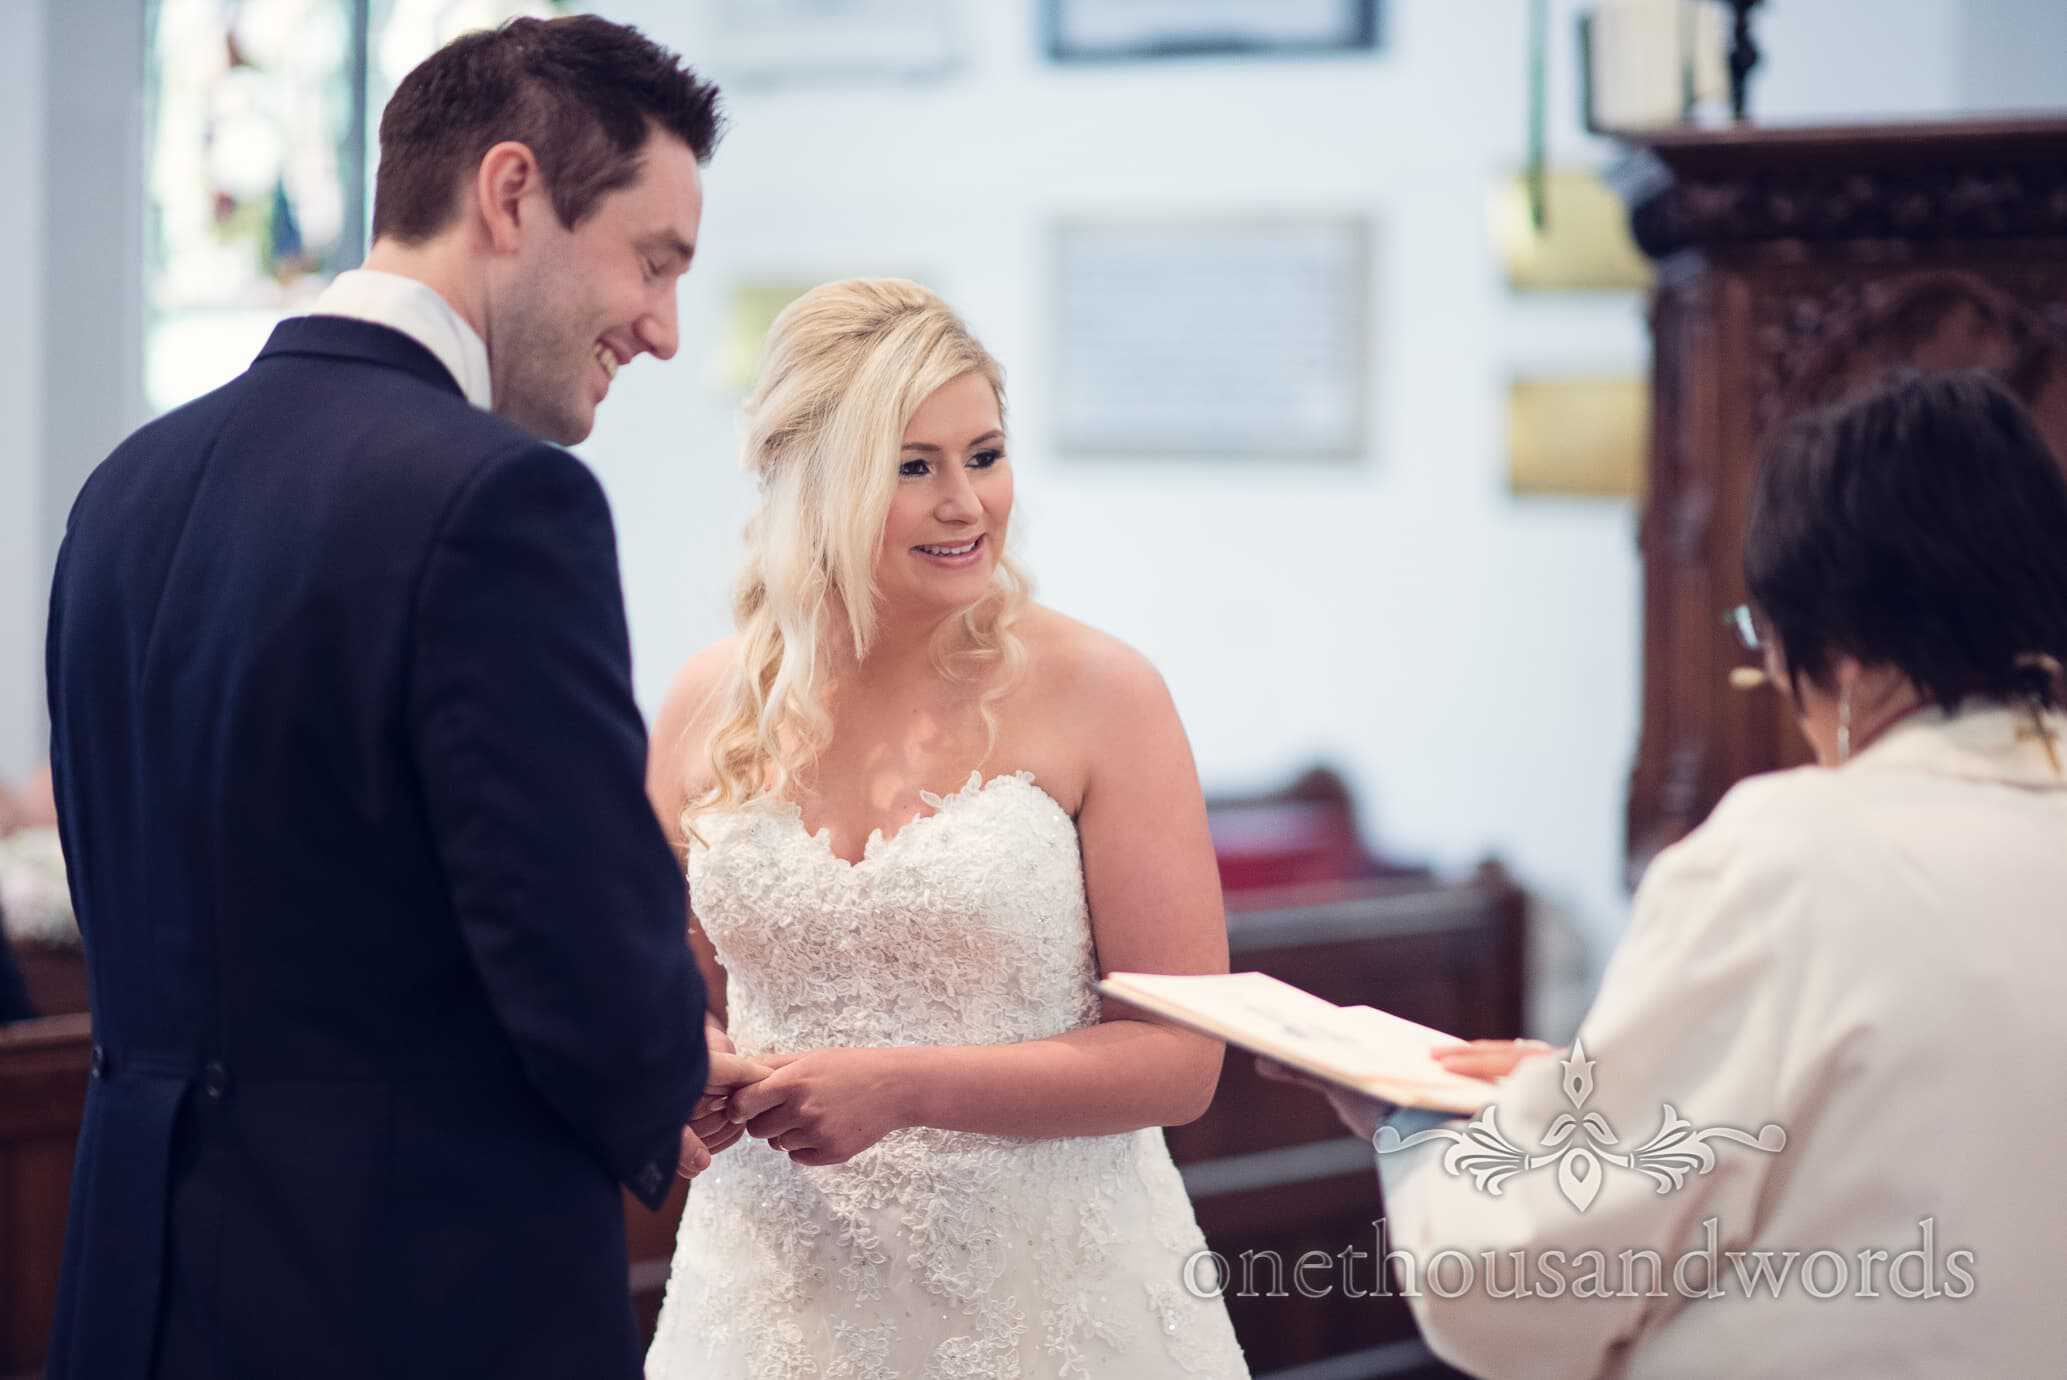 Bride smiles during exchange of the rings at Wareham church wedding